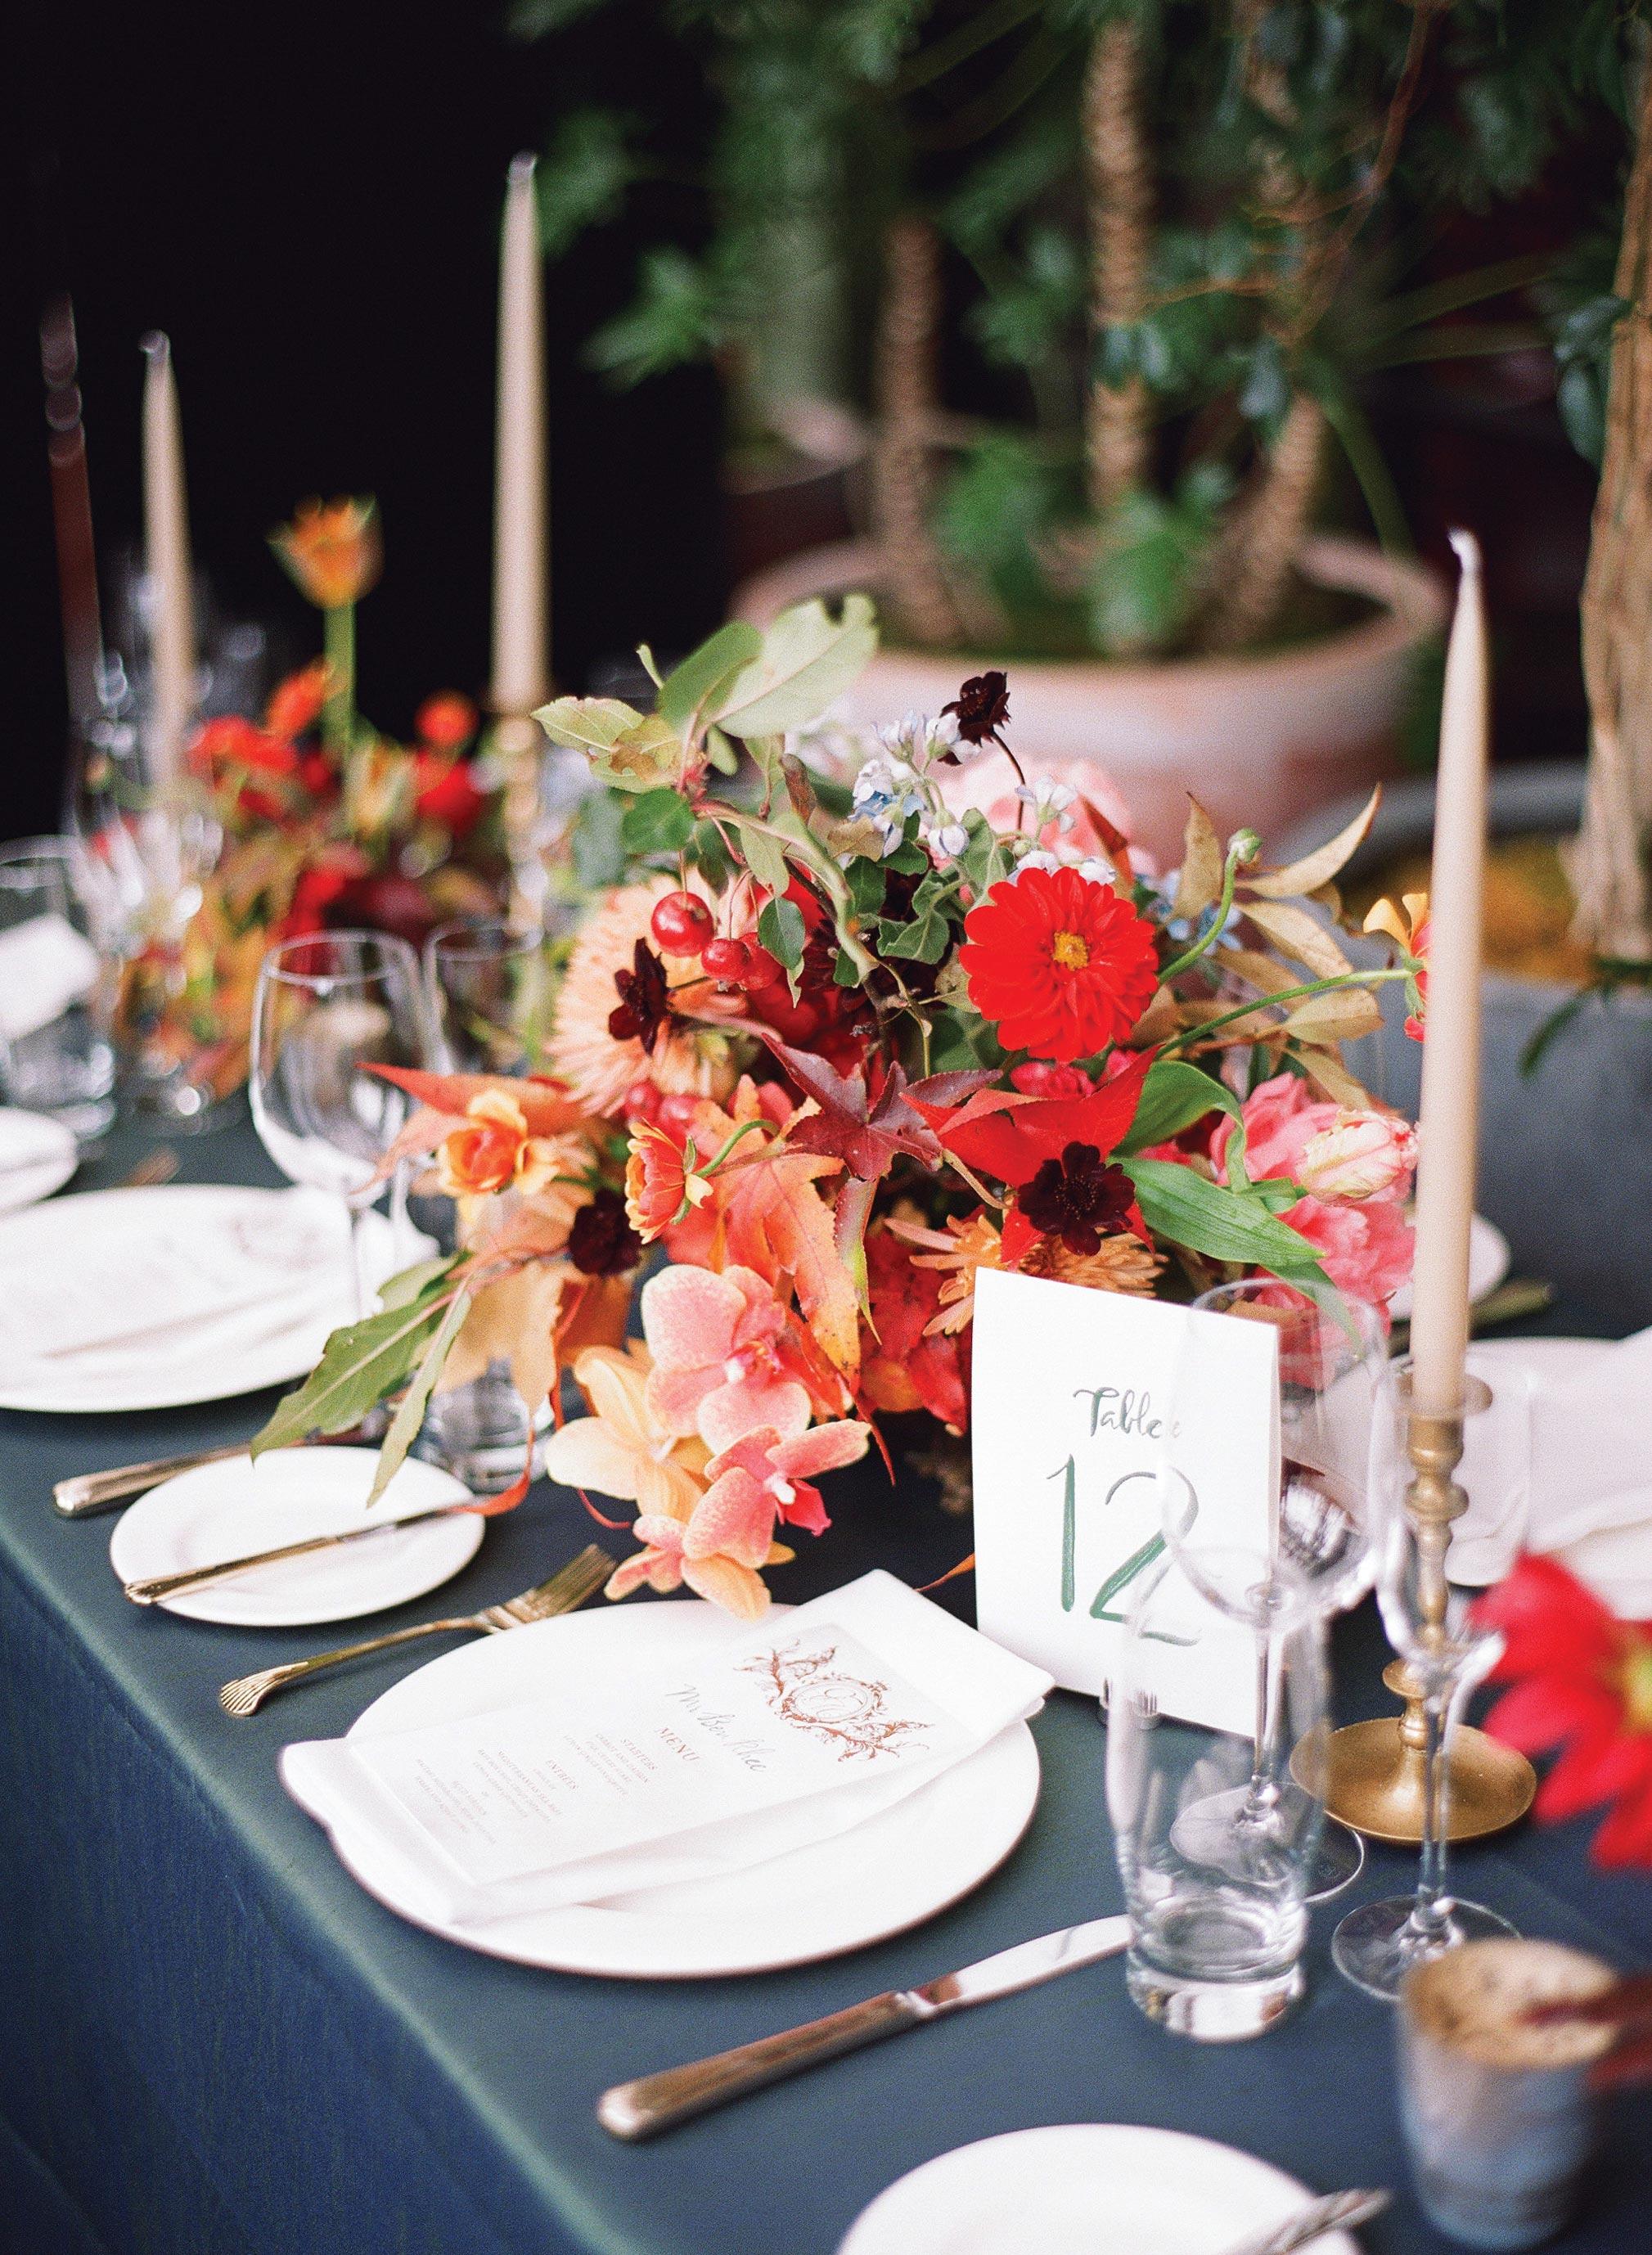 glara matthew wedding table setting centerpiece